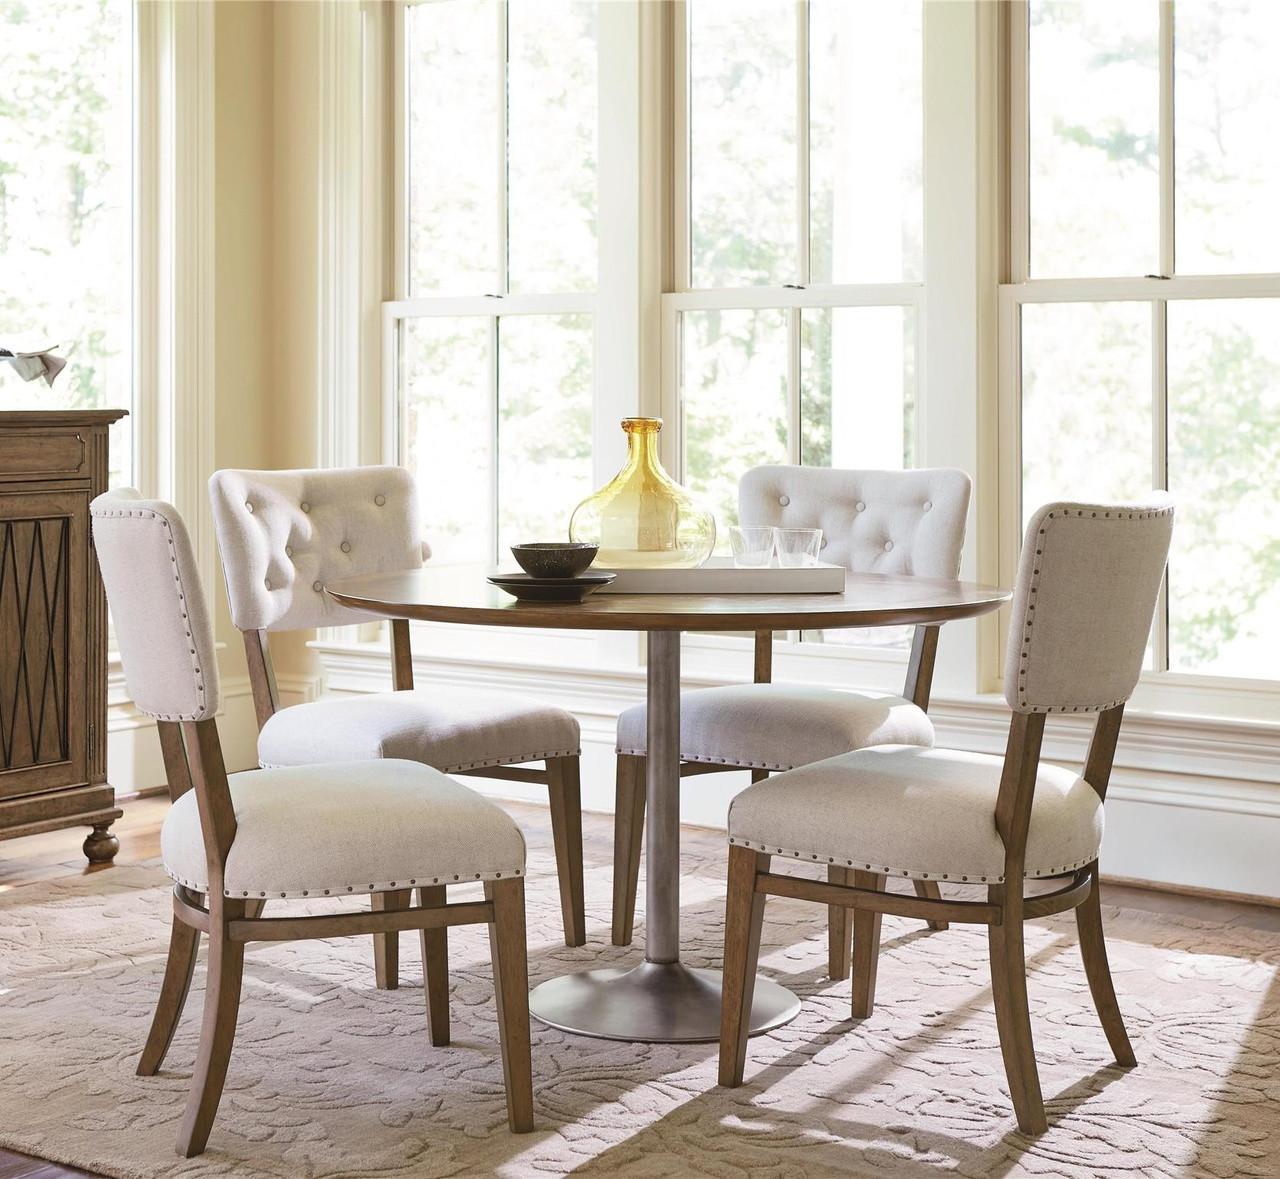 Exceptionnel Maison French Industrial 5 Piece Round Kitchen Table Set